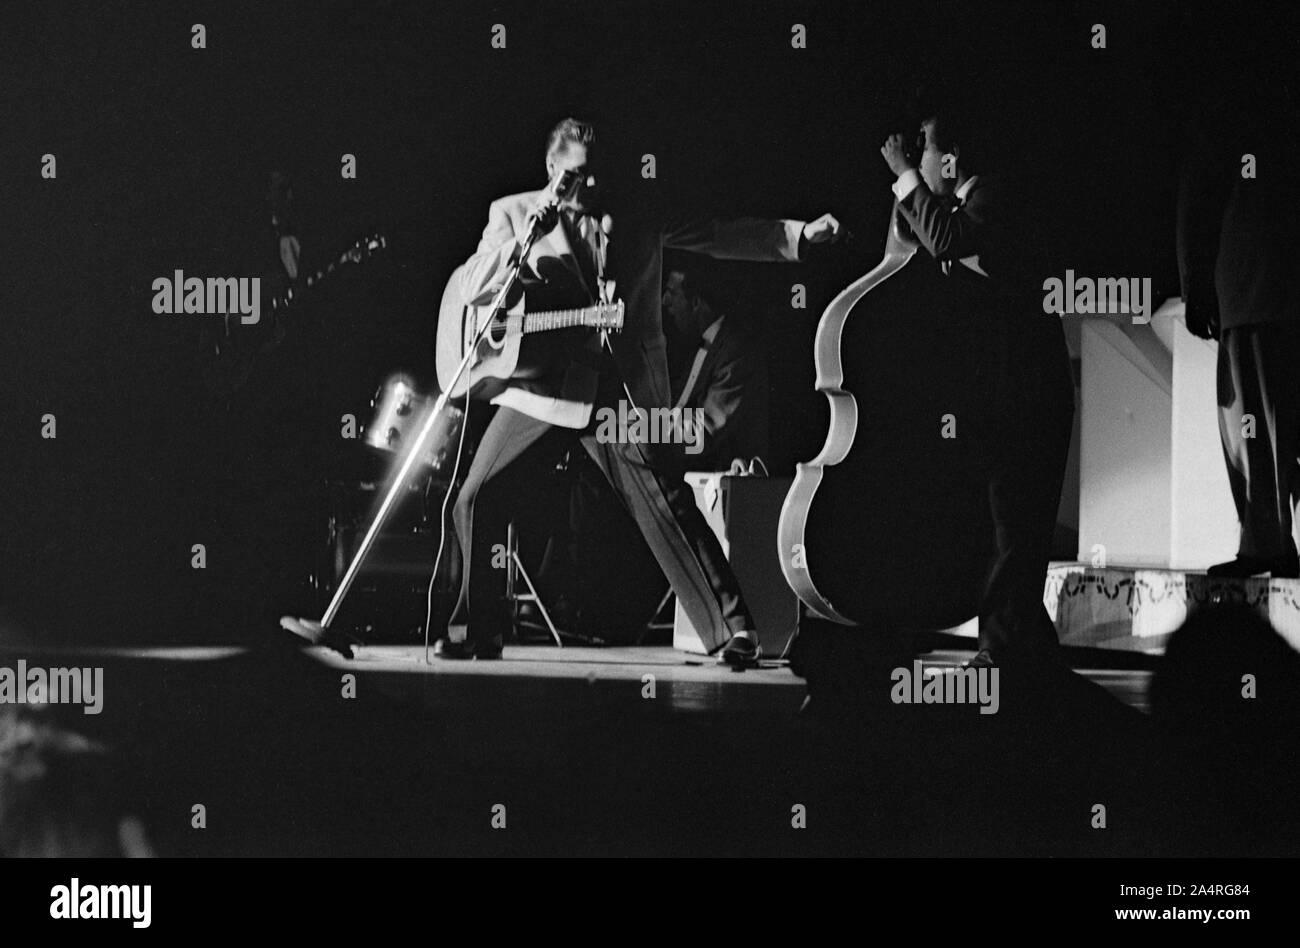 Elvis Presley in Concert im Fox Theater, Detroit, Michigan, 25. Mai 1956. Stockfoto